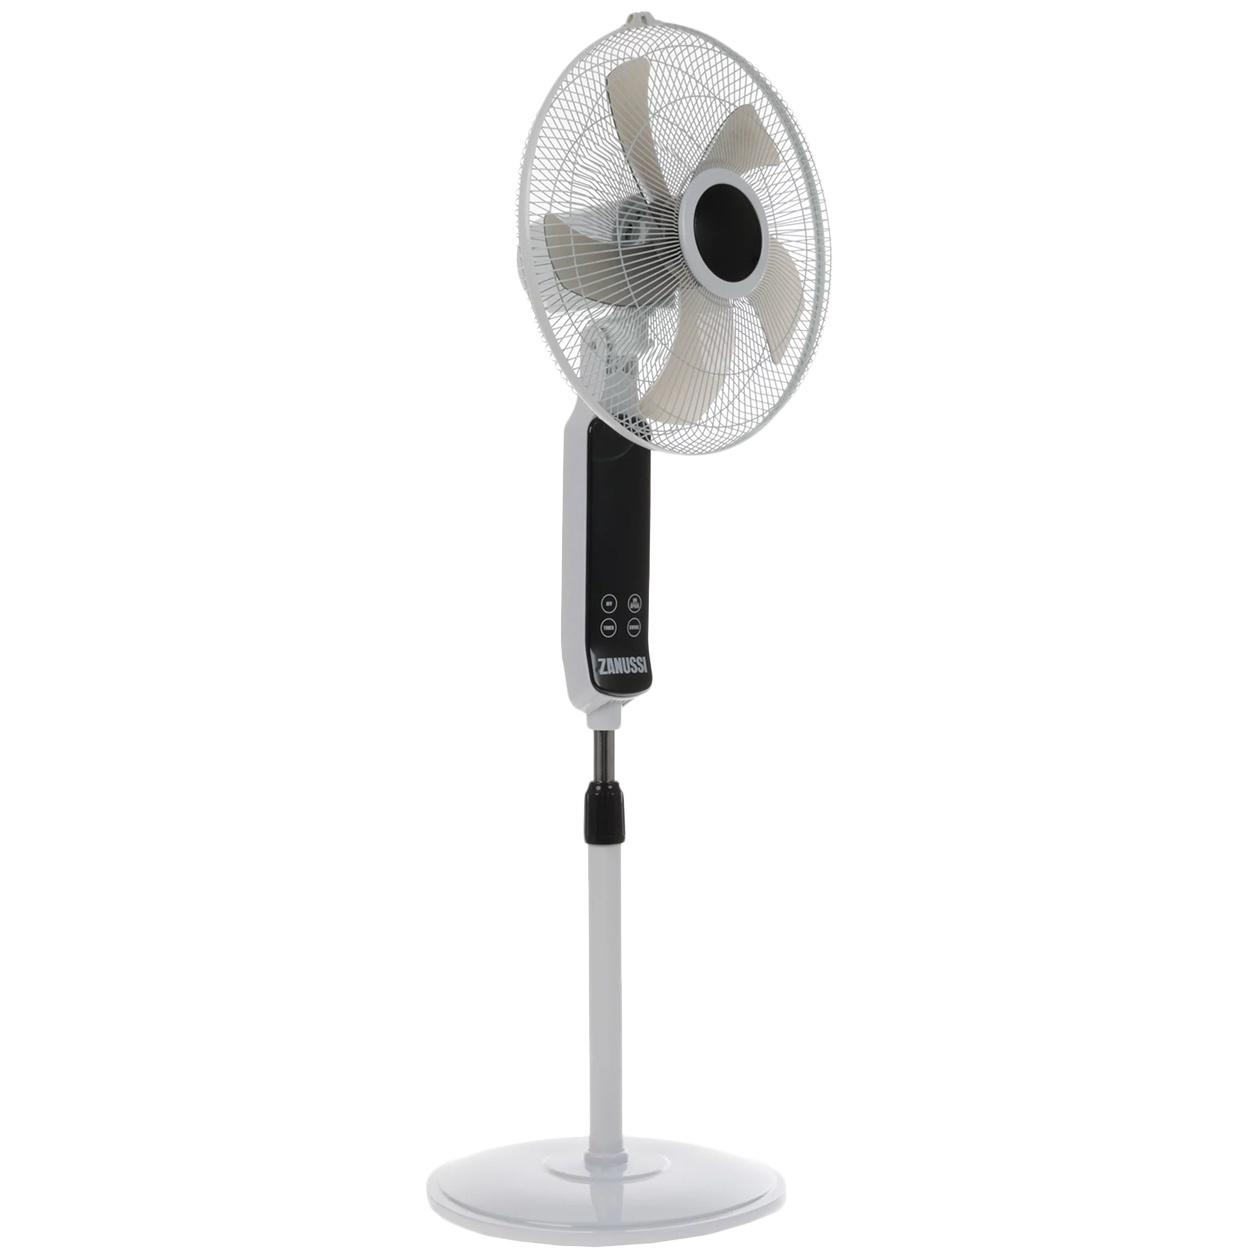 Вентилятор напольный Zanussi ZF 901 white/black